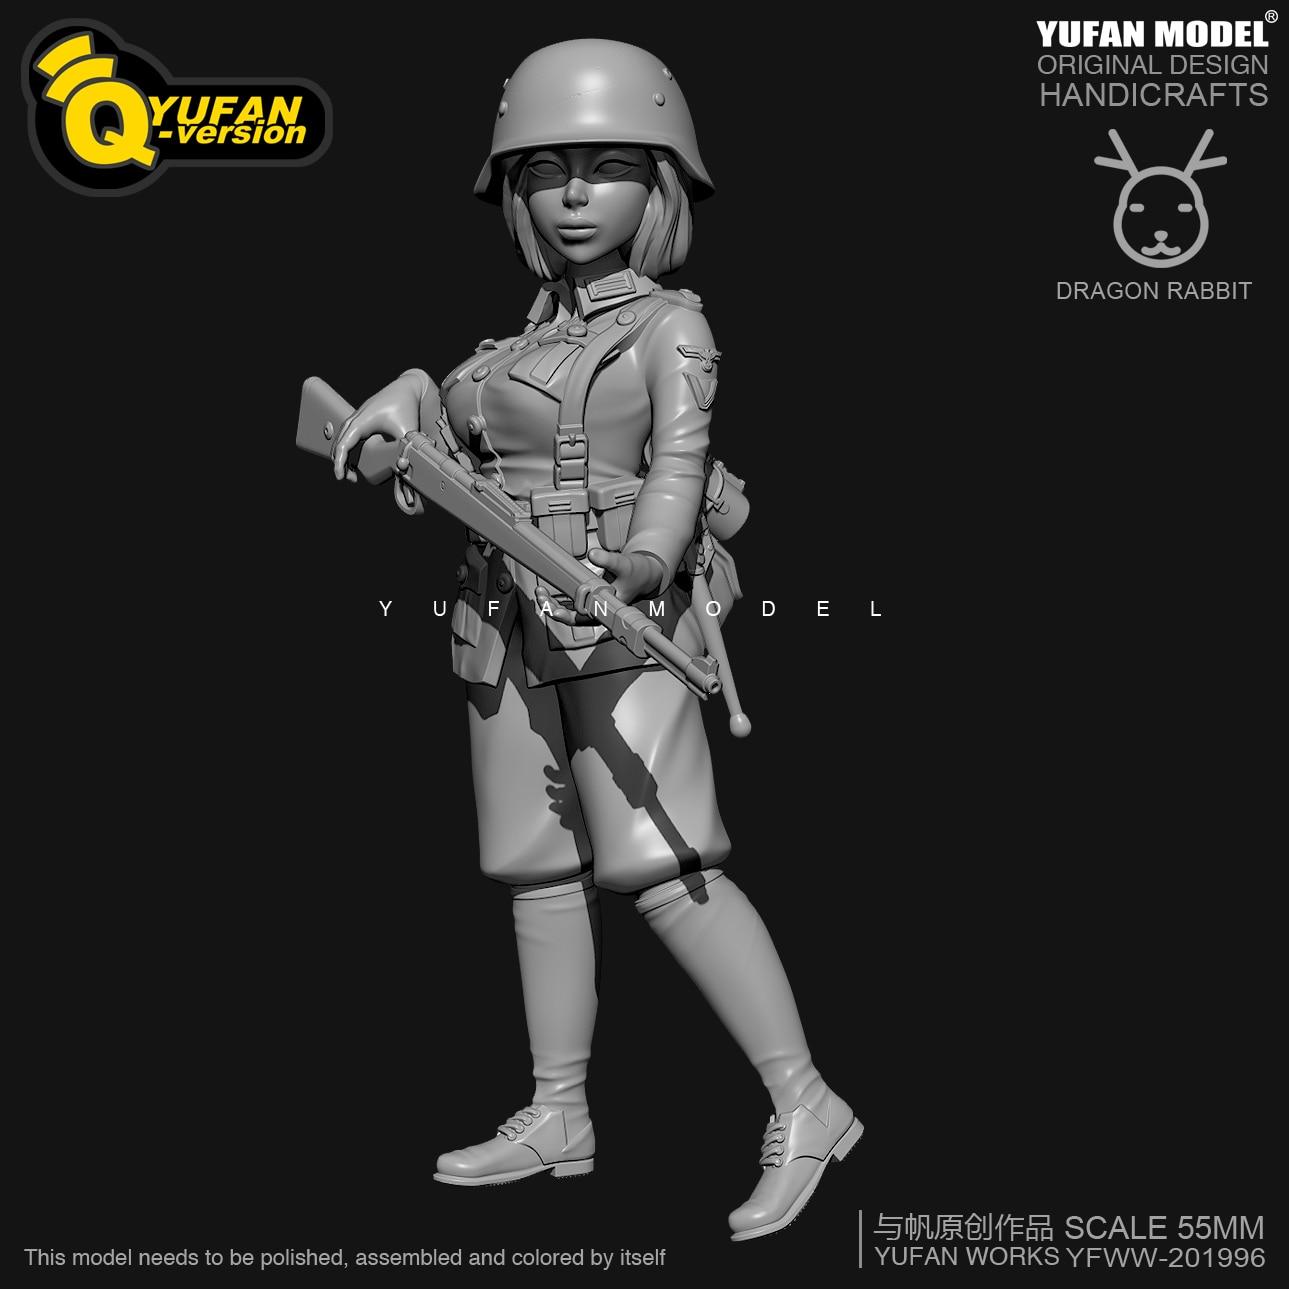 H55mm Resin Figure KitsYufan Model Q Version Resin Female Soldier Self-assembled YFWW35-2058